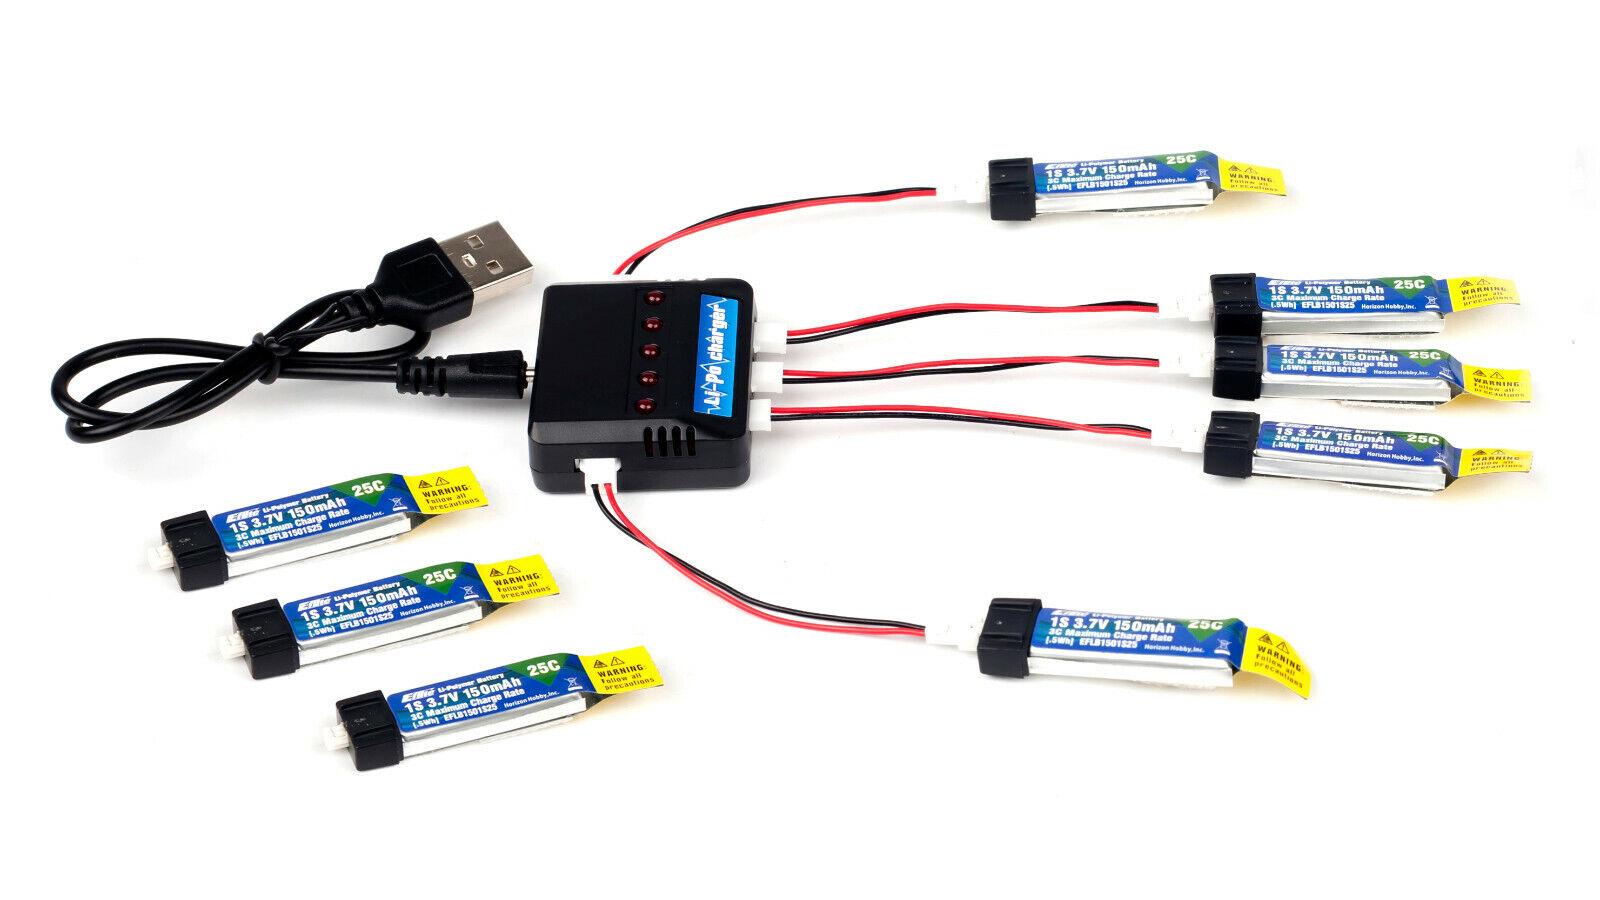 Combo 1x Charger and 8x 150mah 1s 3.7v 25c Lipo Battery E-Fl